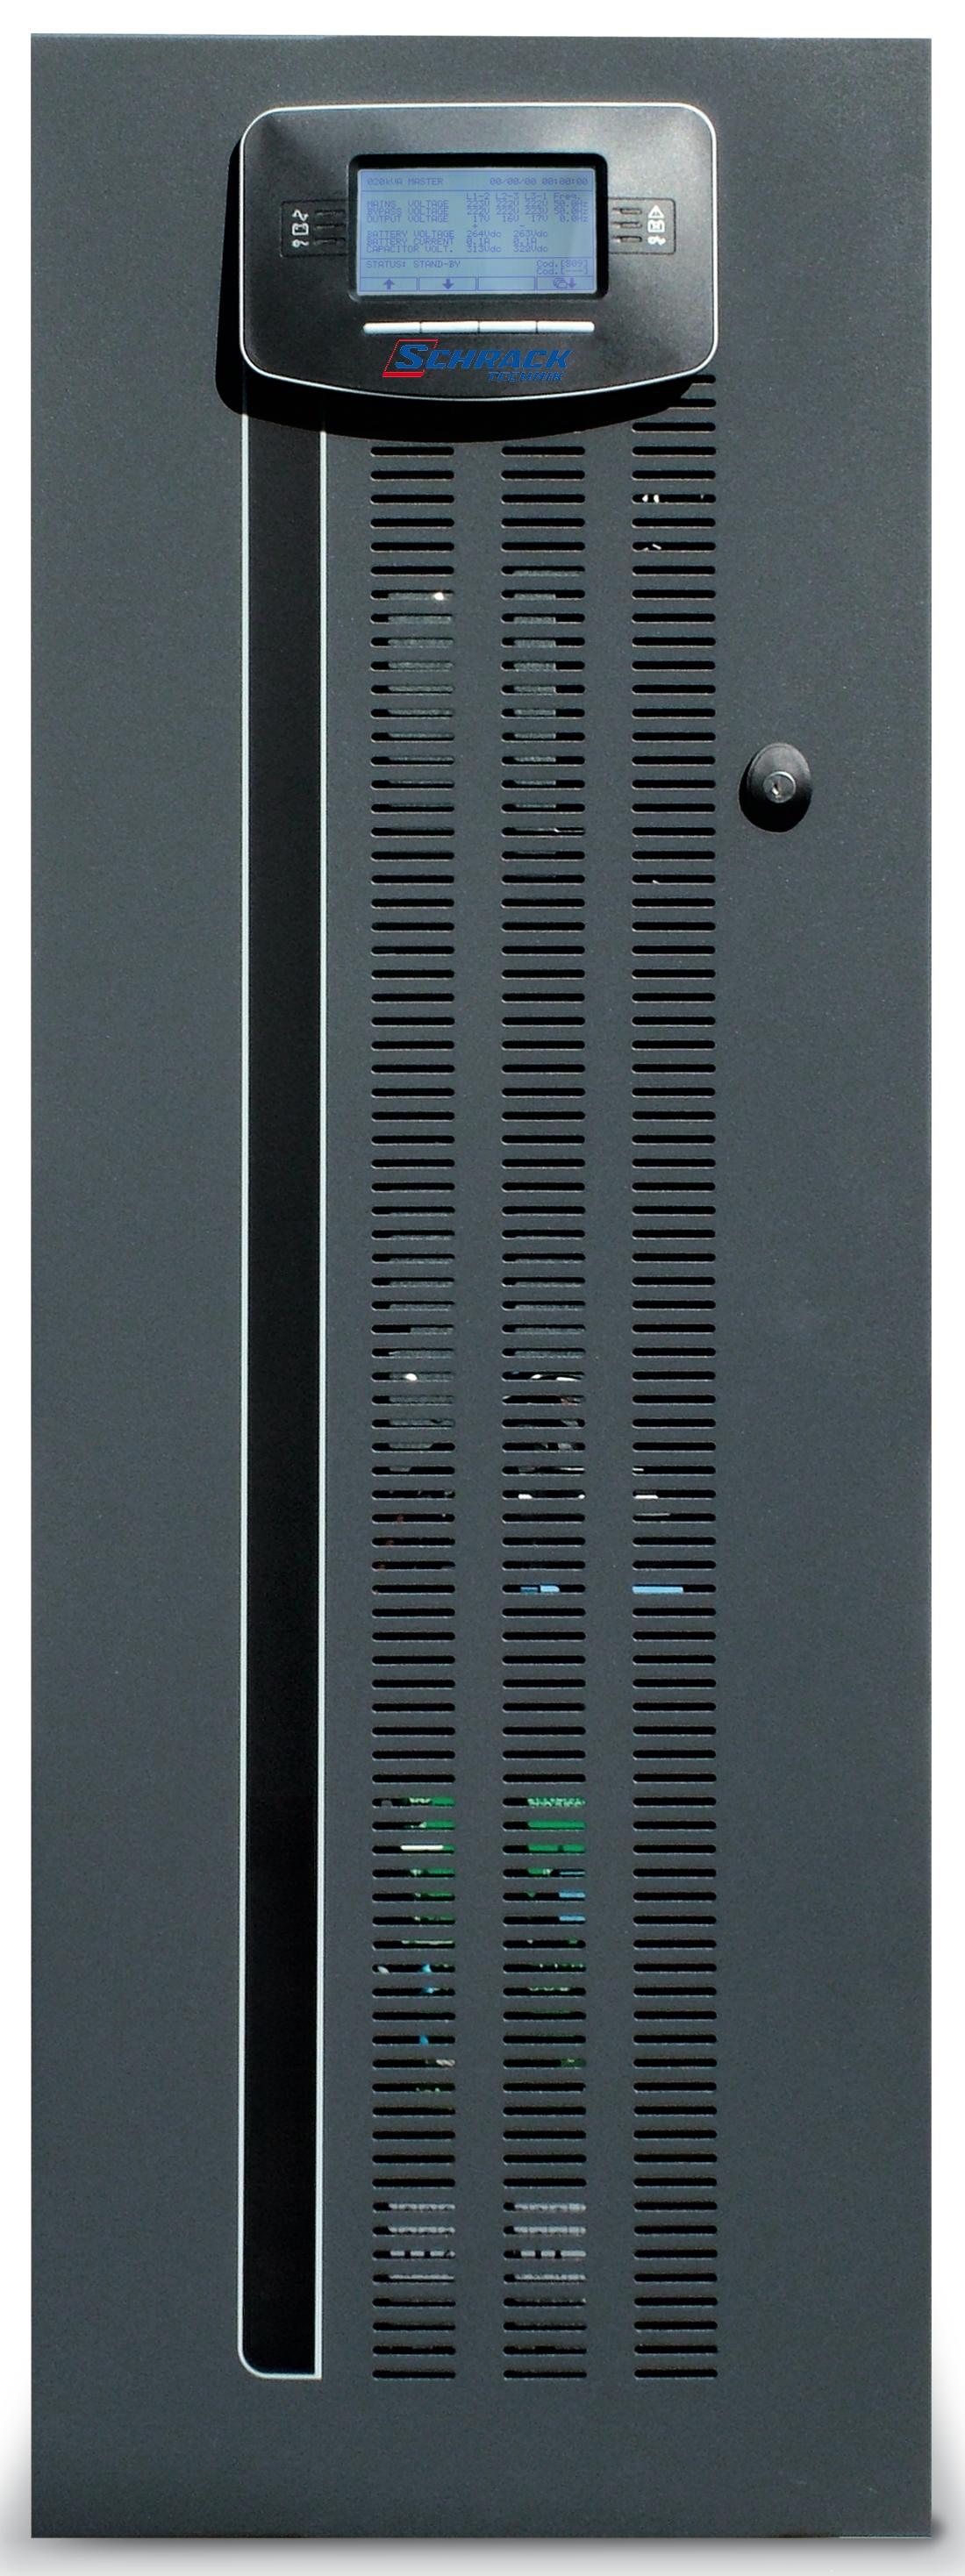 1 Stk USV AVARA Multi 15kVA 13,5kW 9Min. 3ph/3ph /Online USMLT15XA5